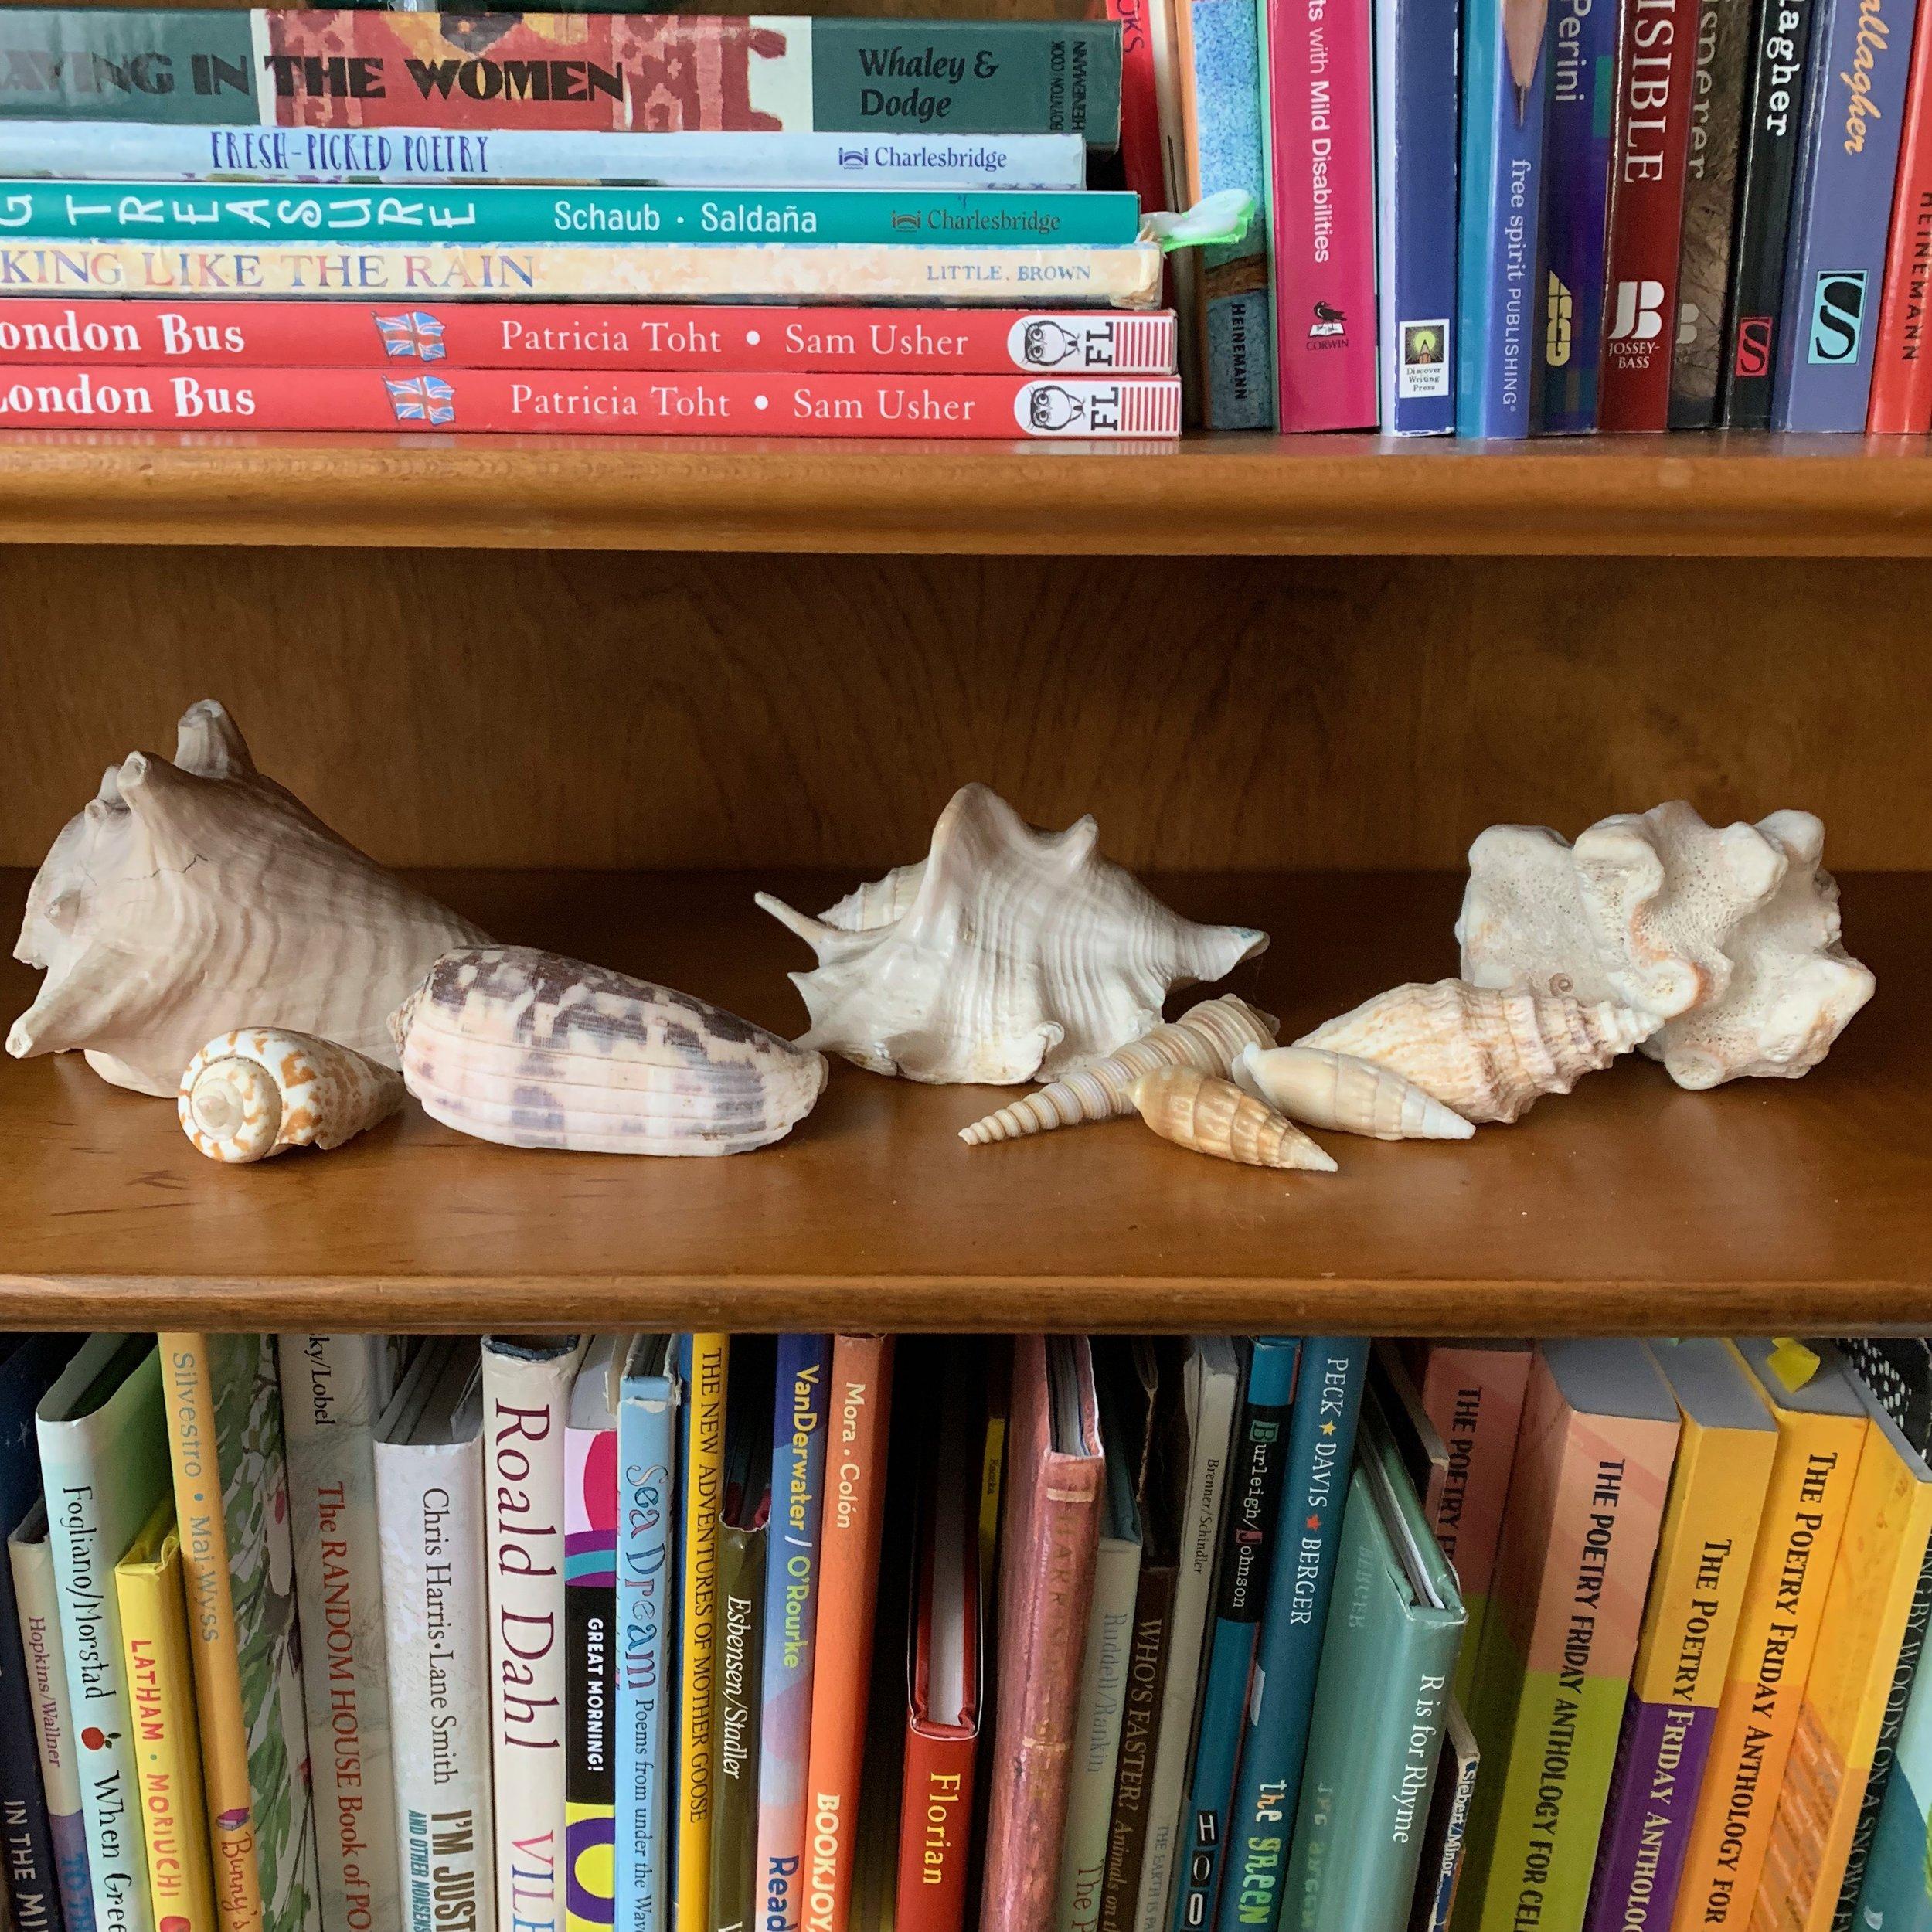 My grandma's seashells.